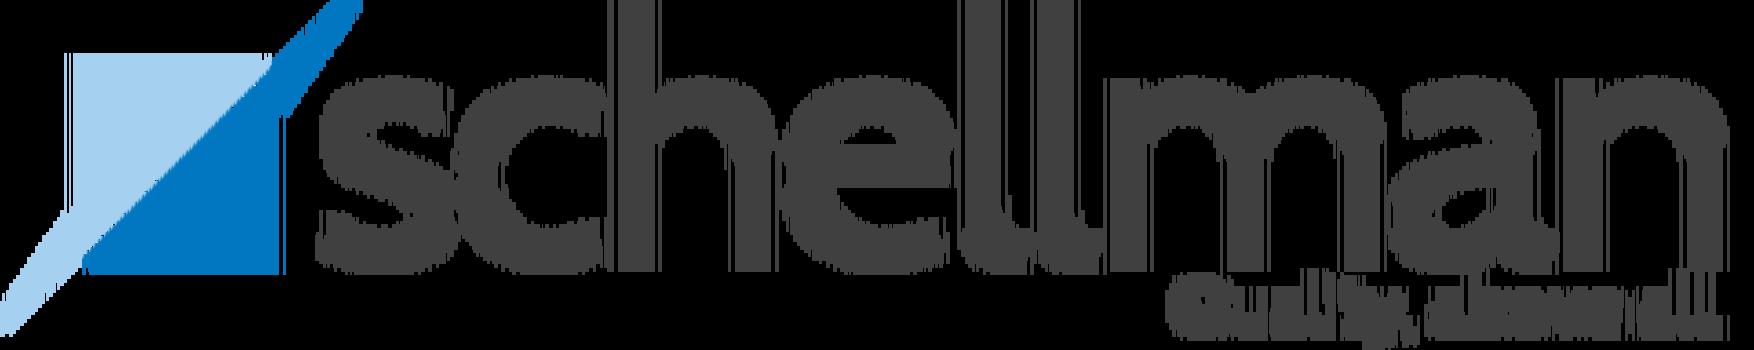 Schellman & Company, LLC logo